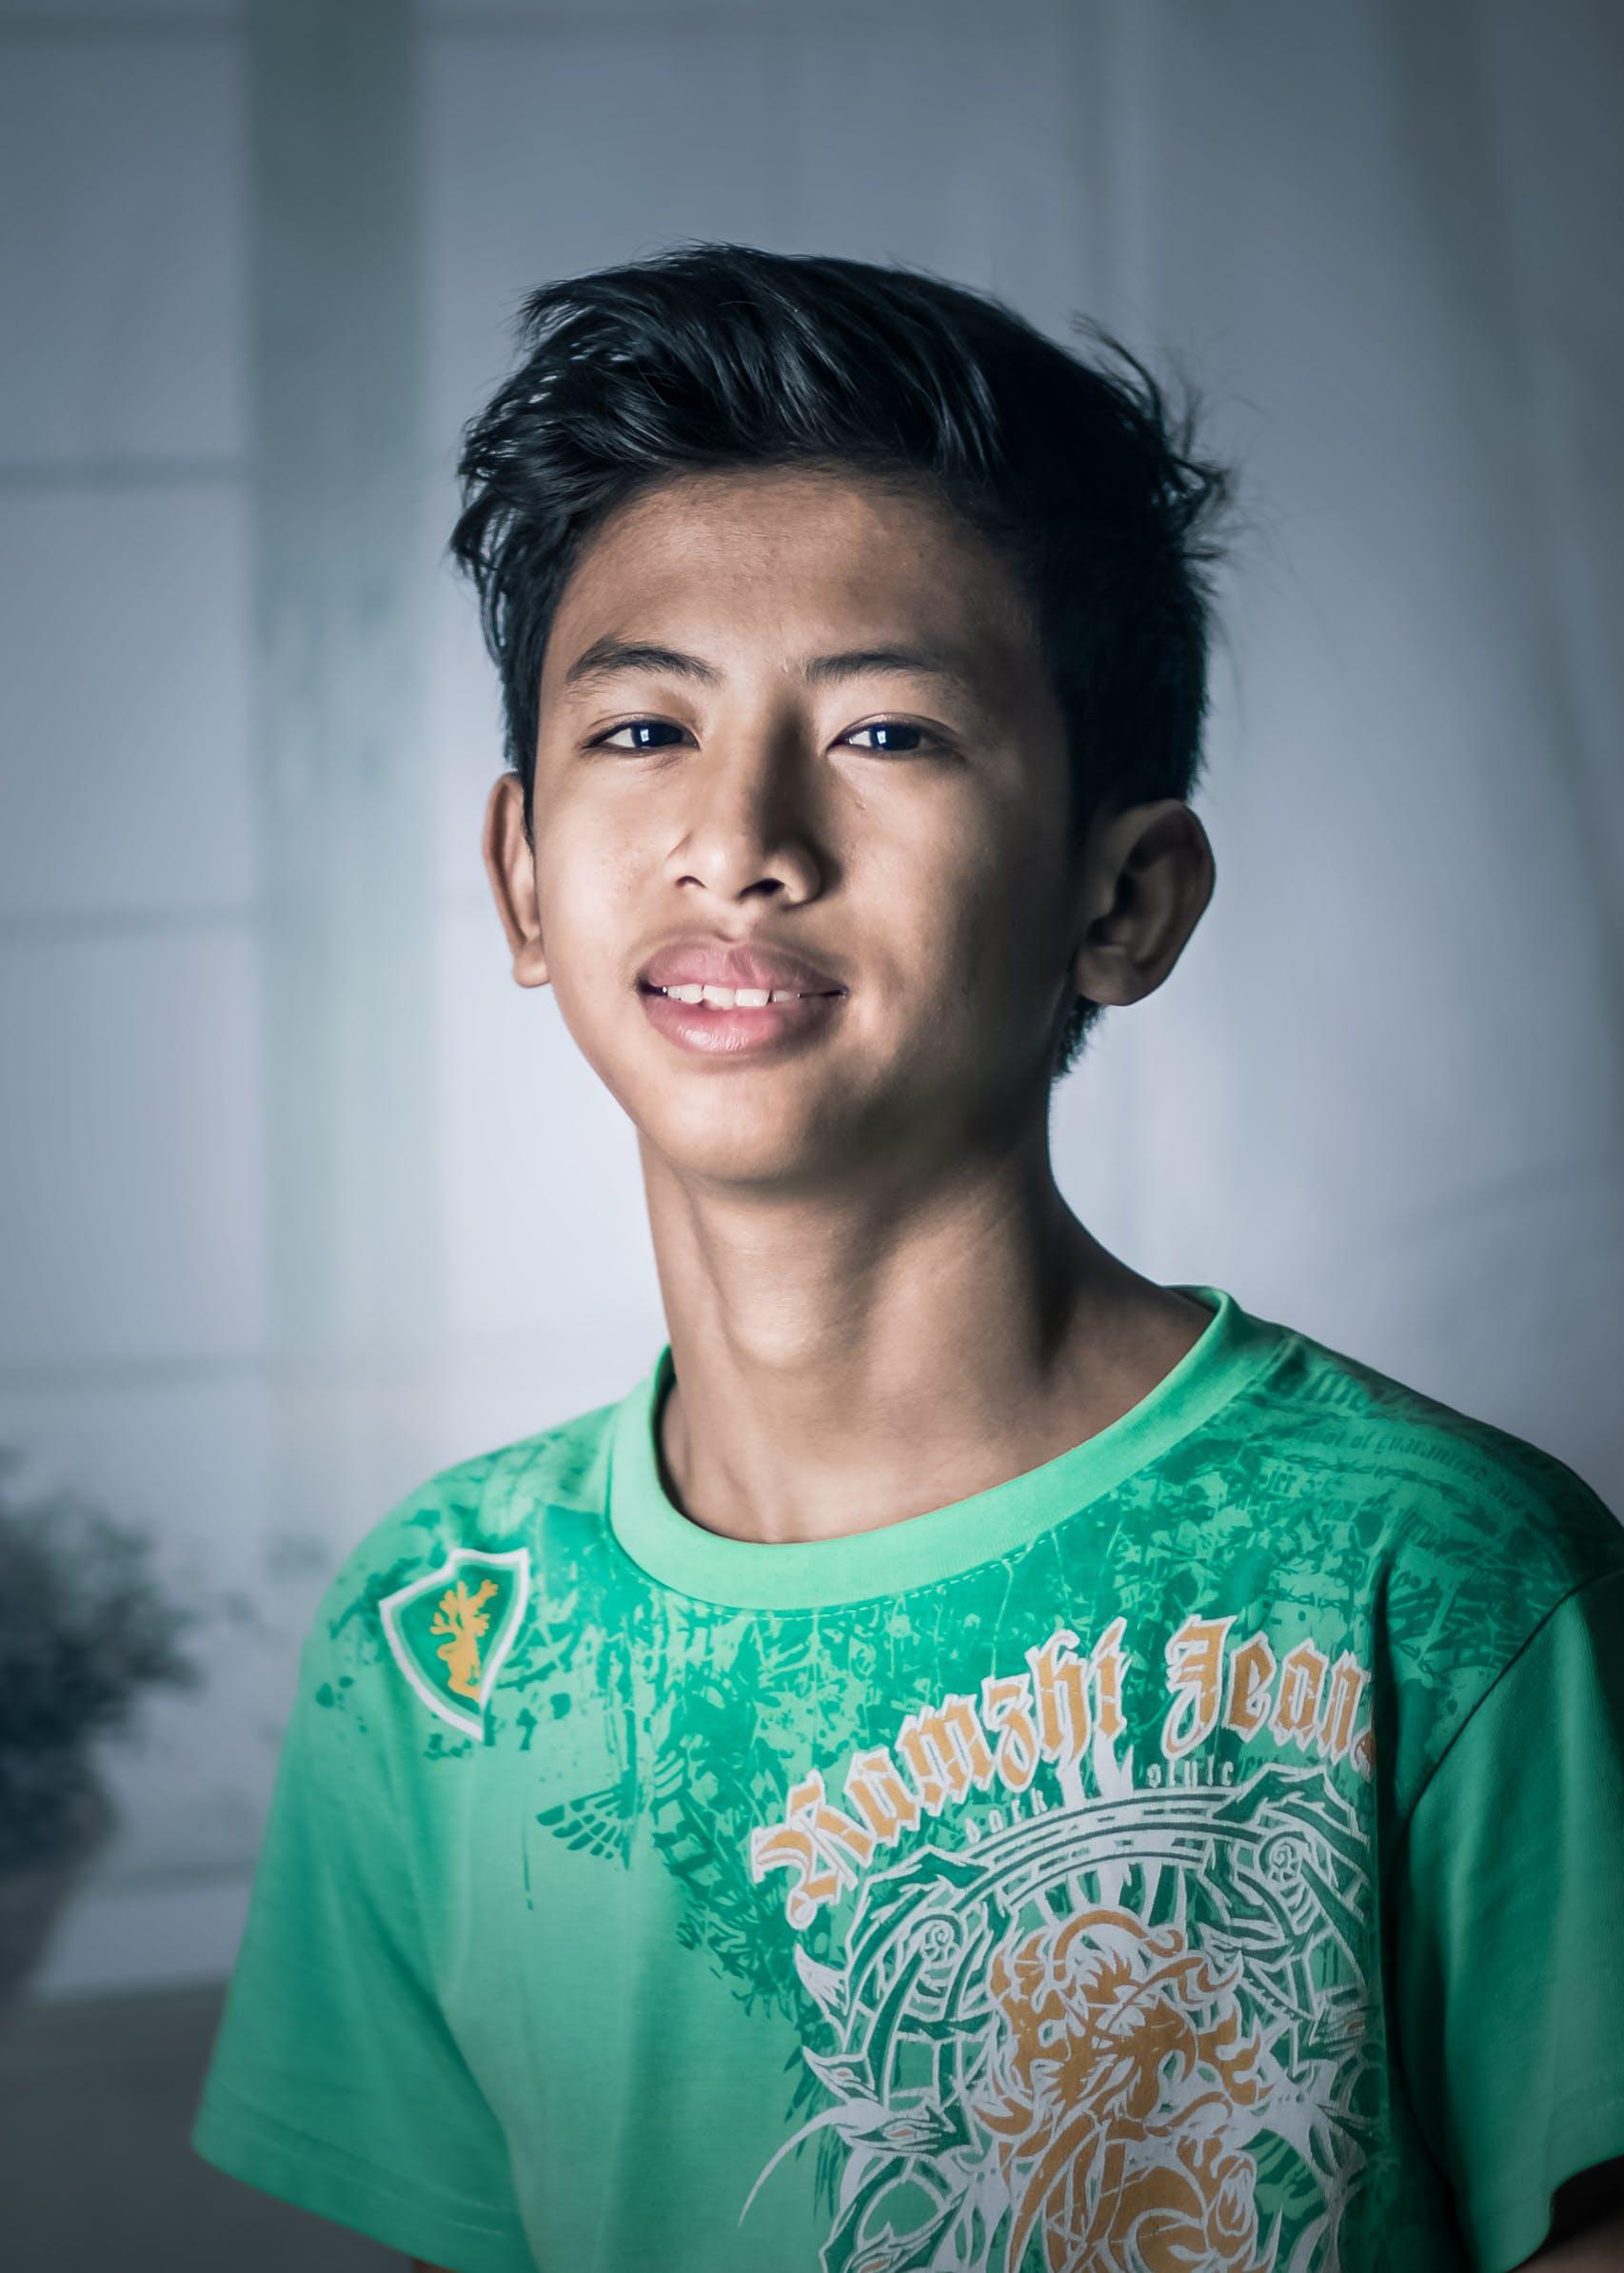 Photo of Boy